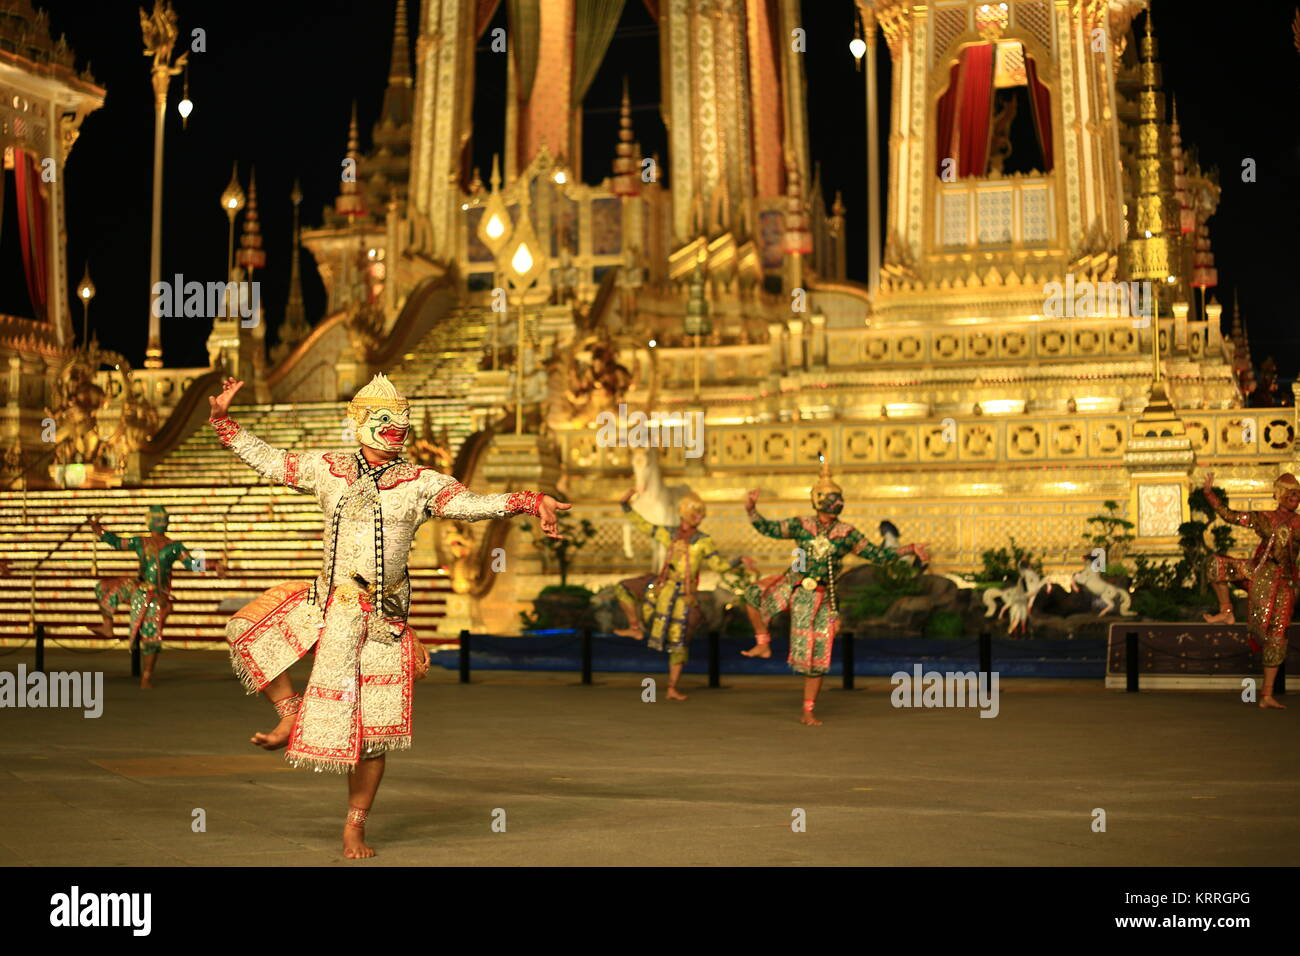 Khon performance high art dance show in front of King Rama IX Crematorium pyre site.  Thailand, Bangkok, December - Stock Image